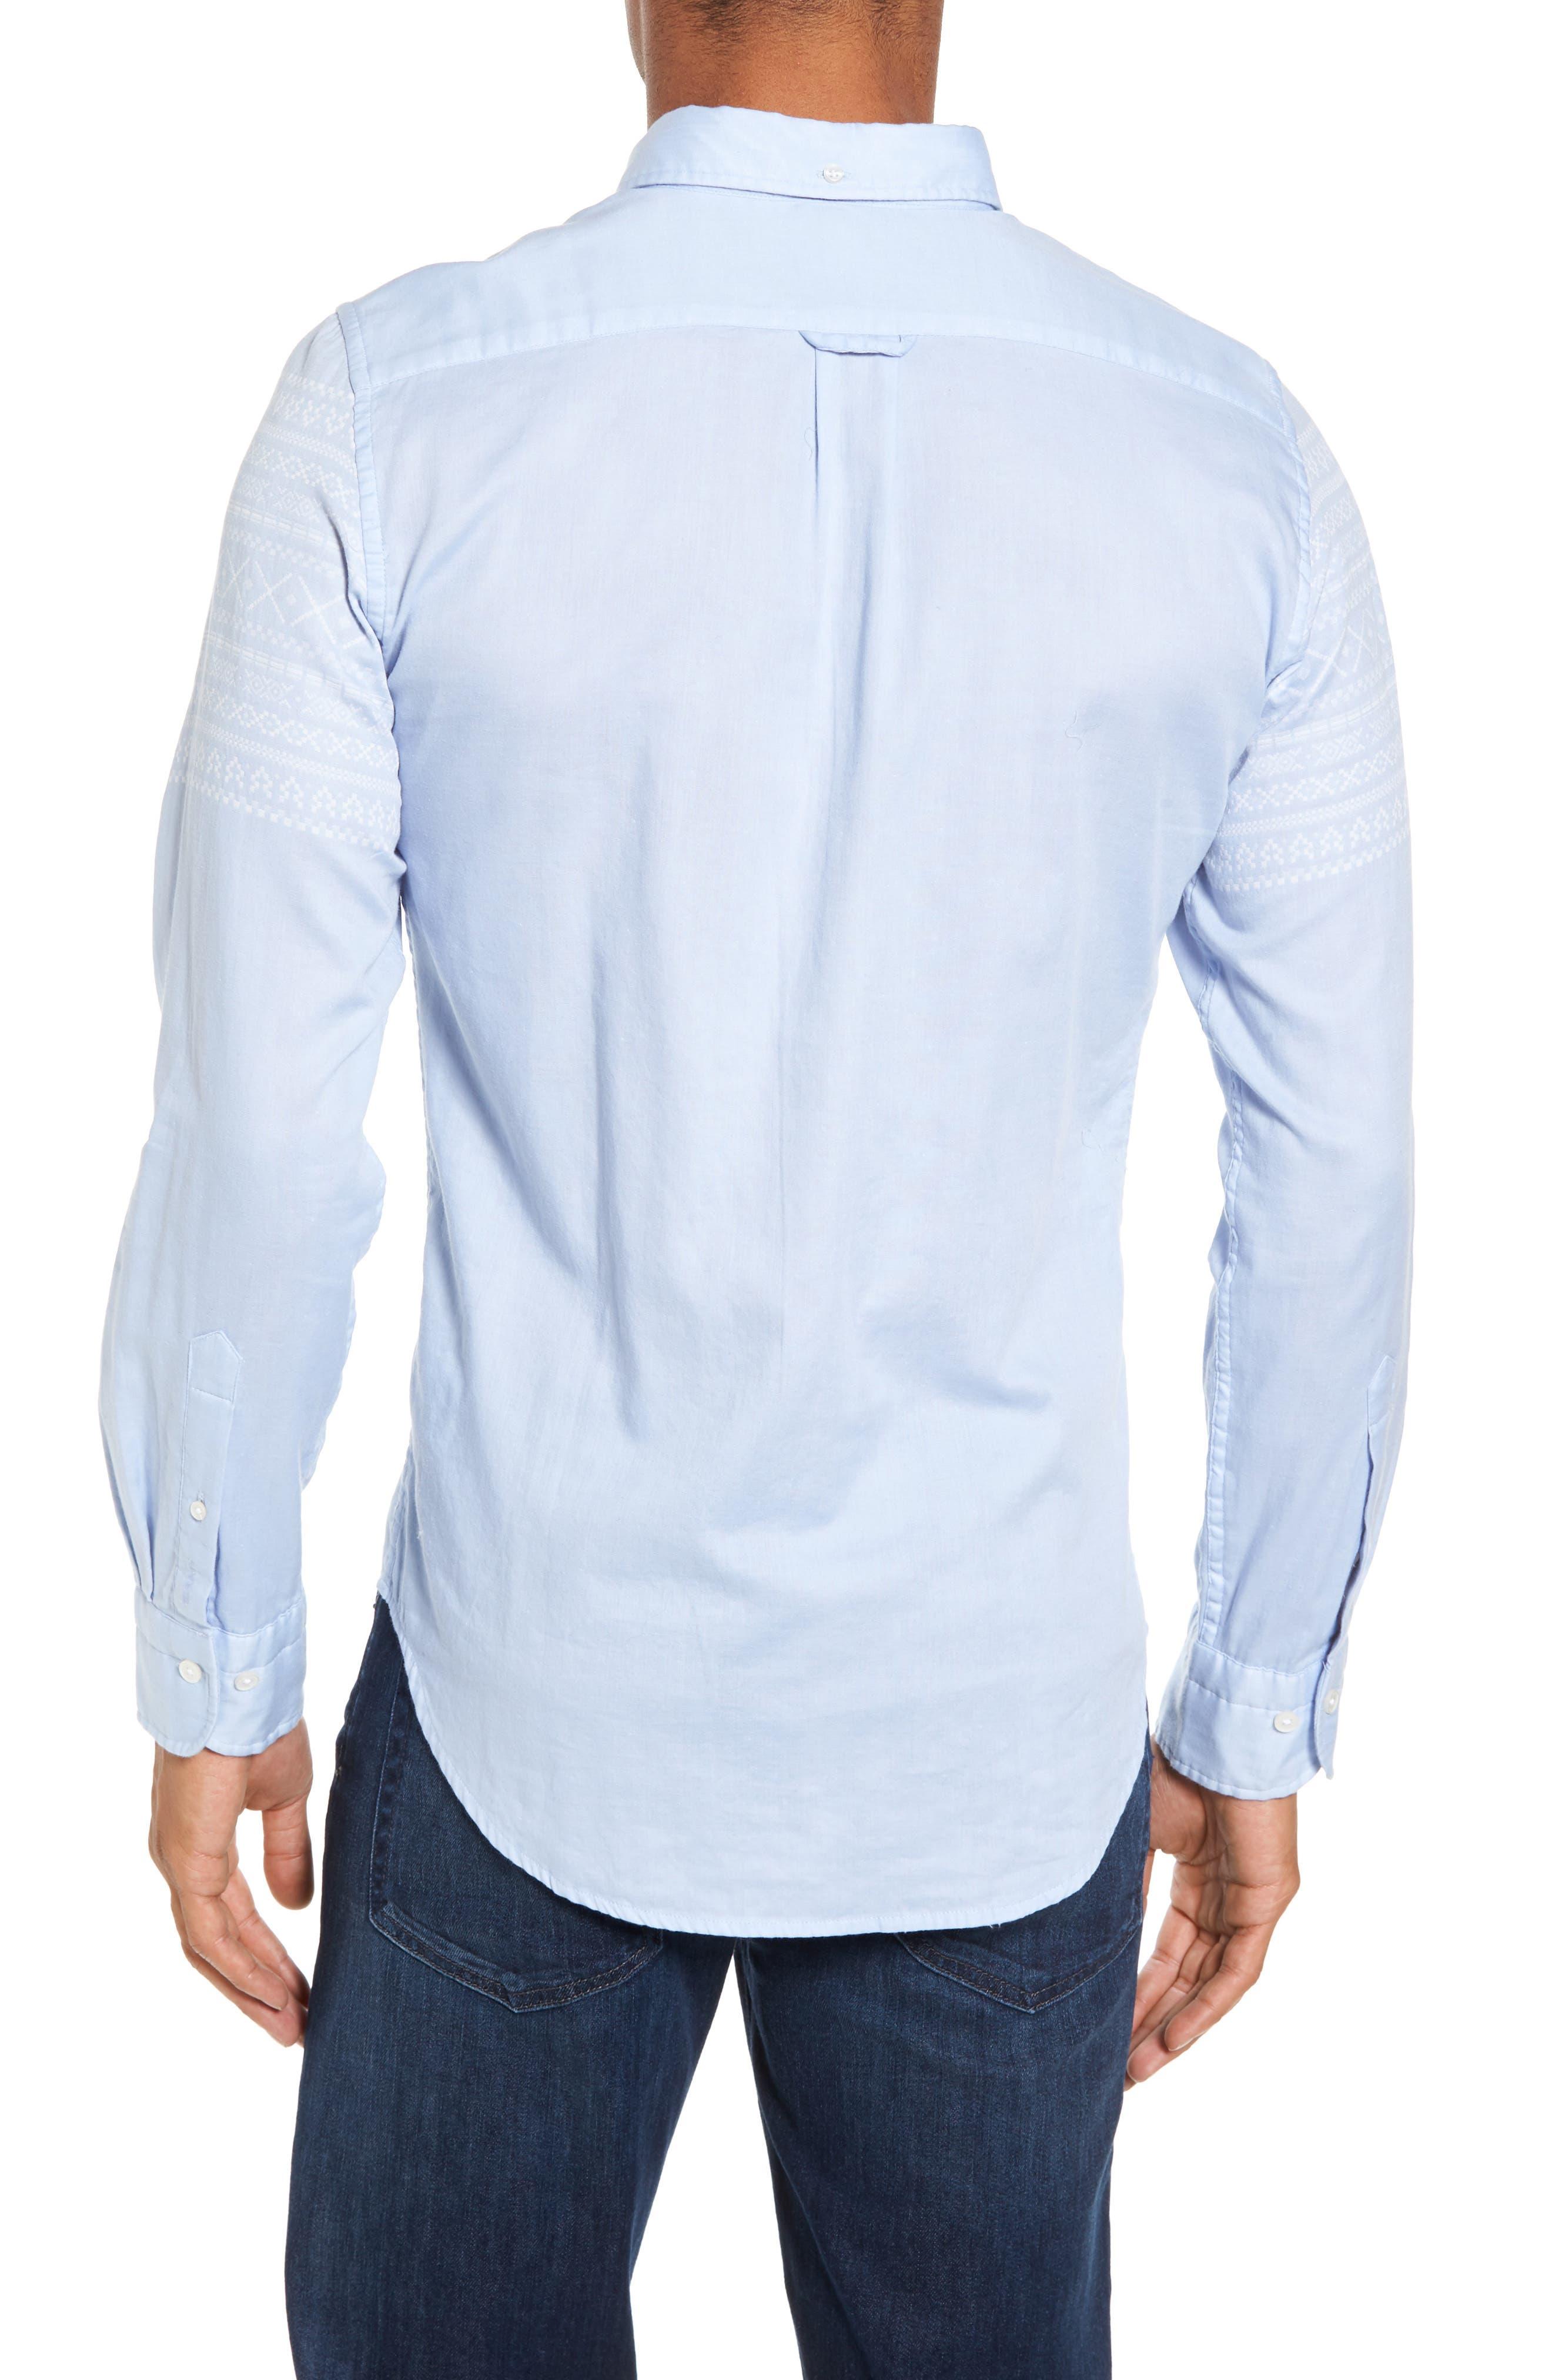 02 Extra Slim Fit Fair Isle Print Sport Shirt,                             Alternate thumbnail 2, color,                             420